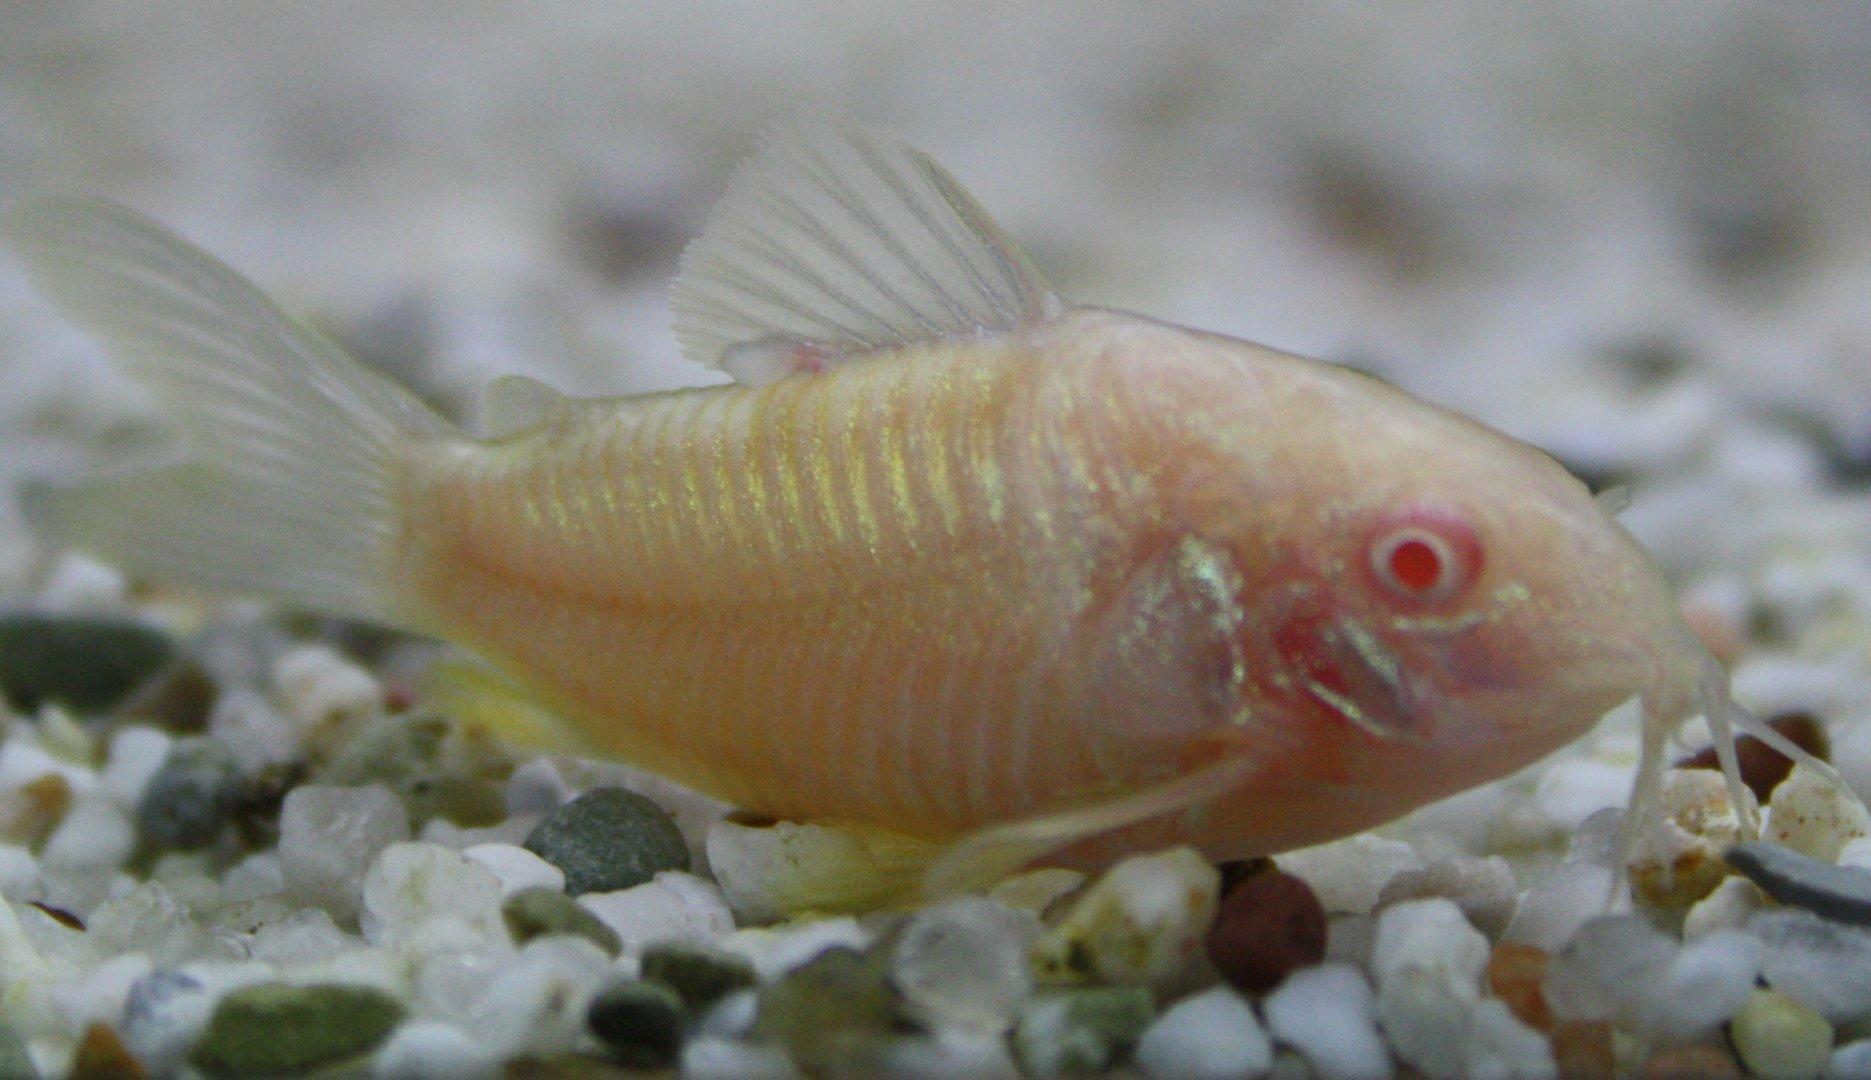 Albino Panzerwels (Corydoras paleatus)